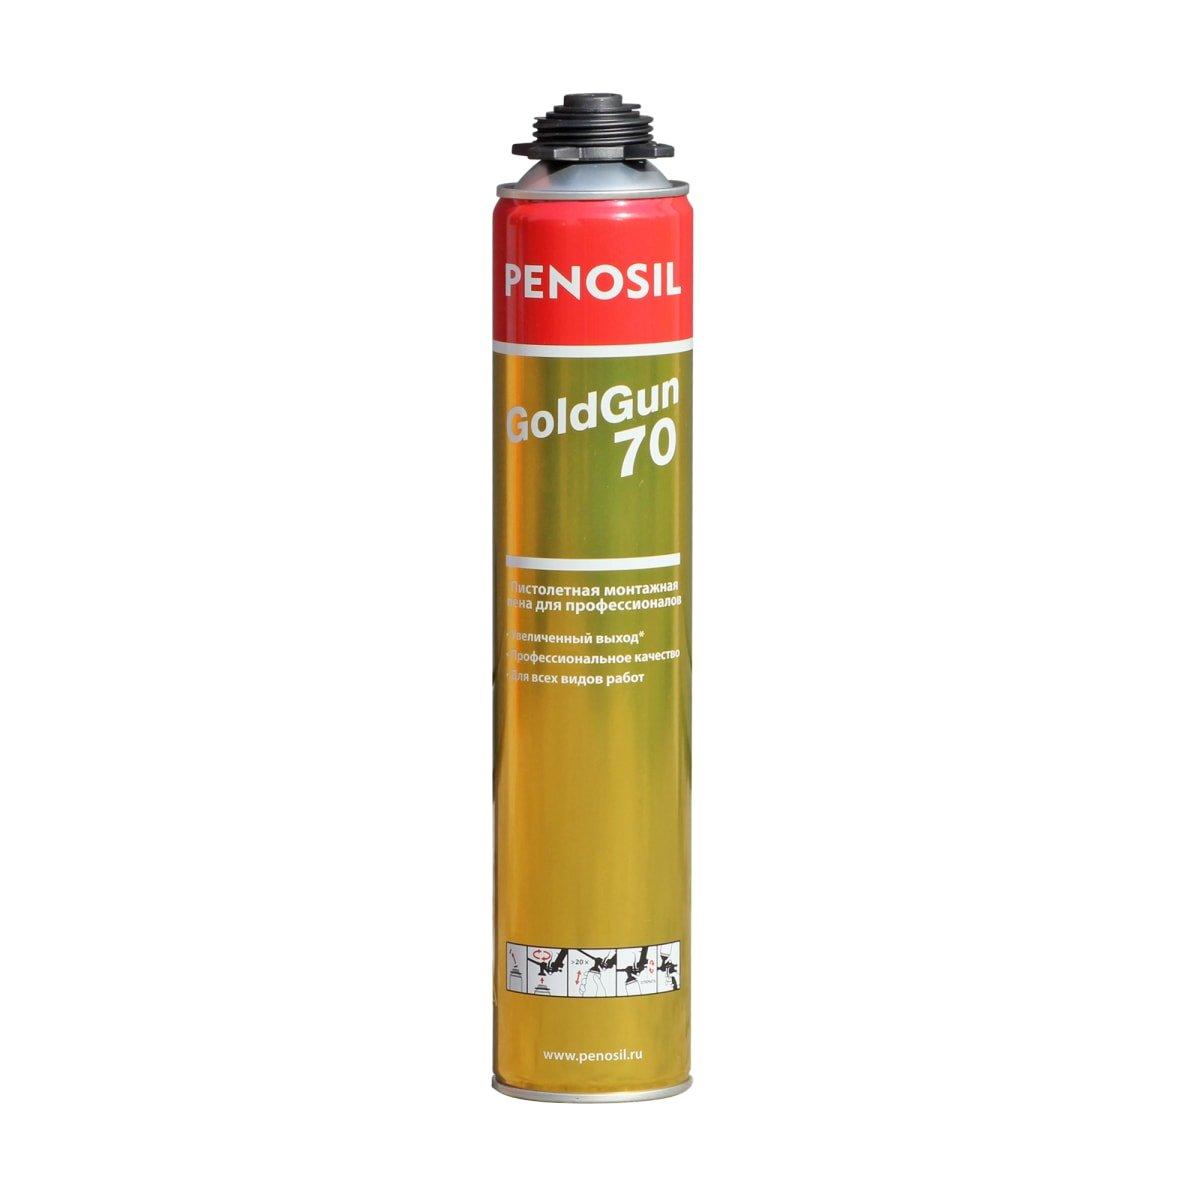 Penosil Gold Gun 70